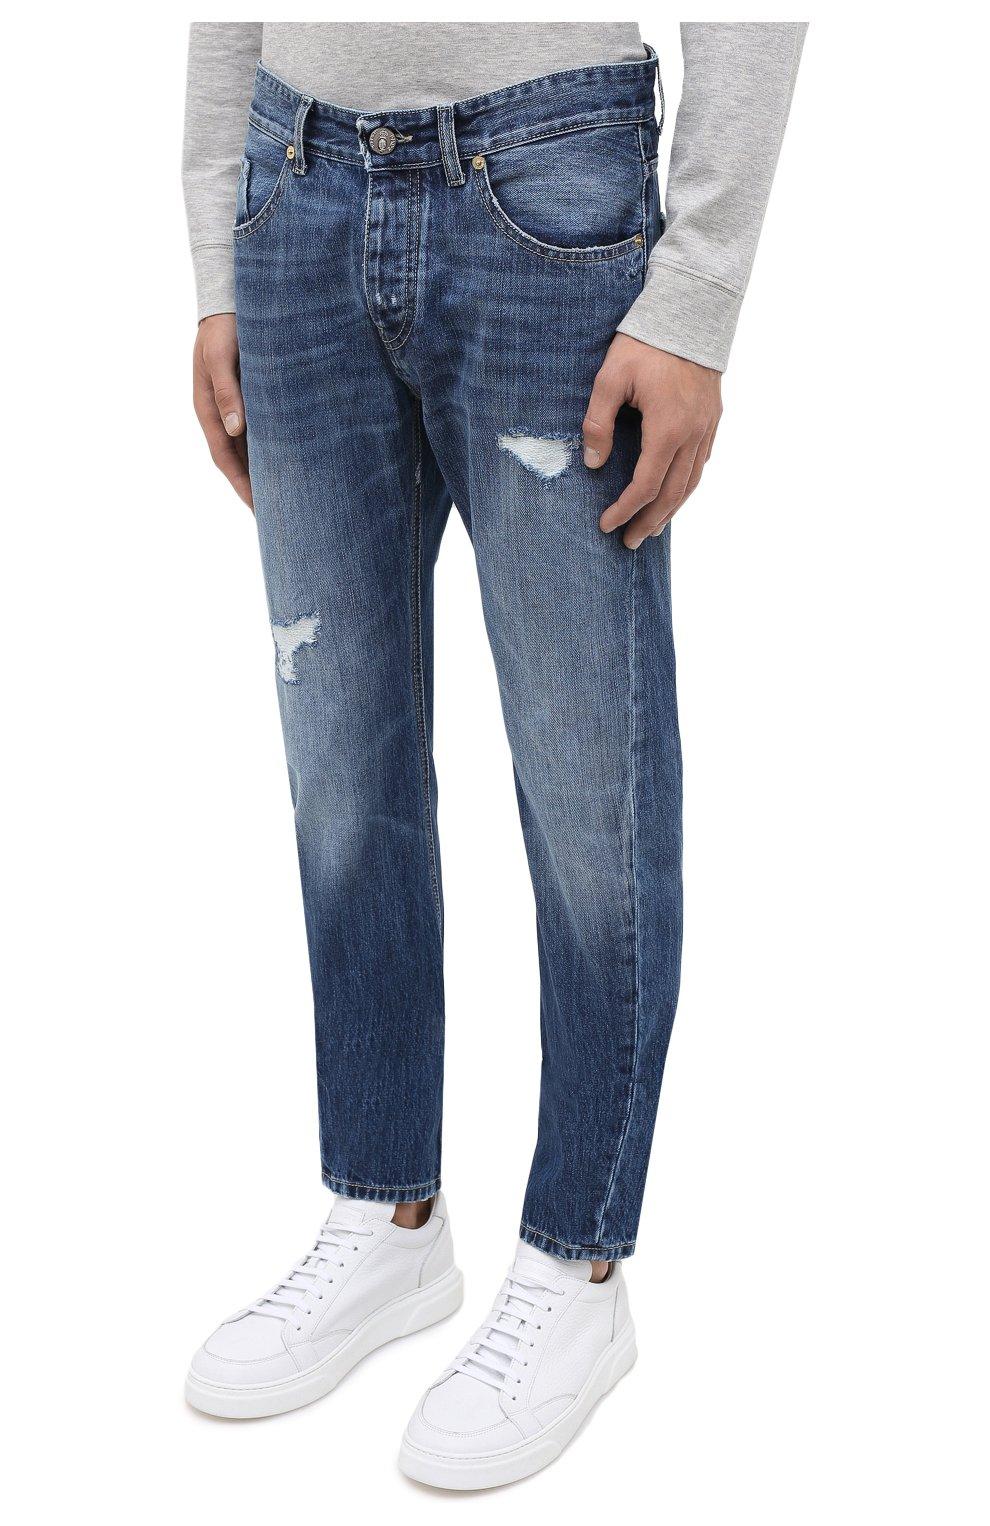 Мужские джинсы PREMIUM MOOD DENIM SUPERIOR синего цвета, арт. F21 352740215/BARRET | Фото 3